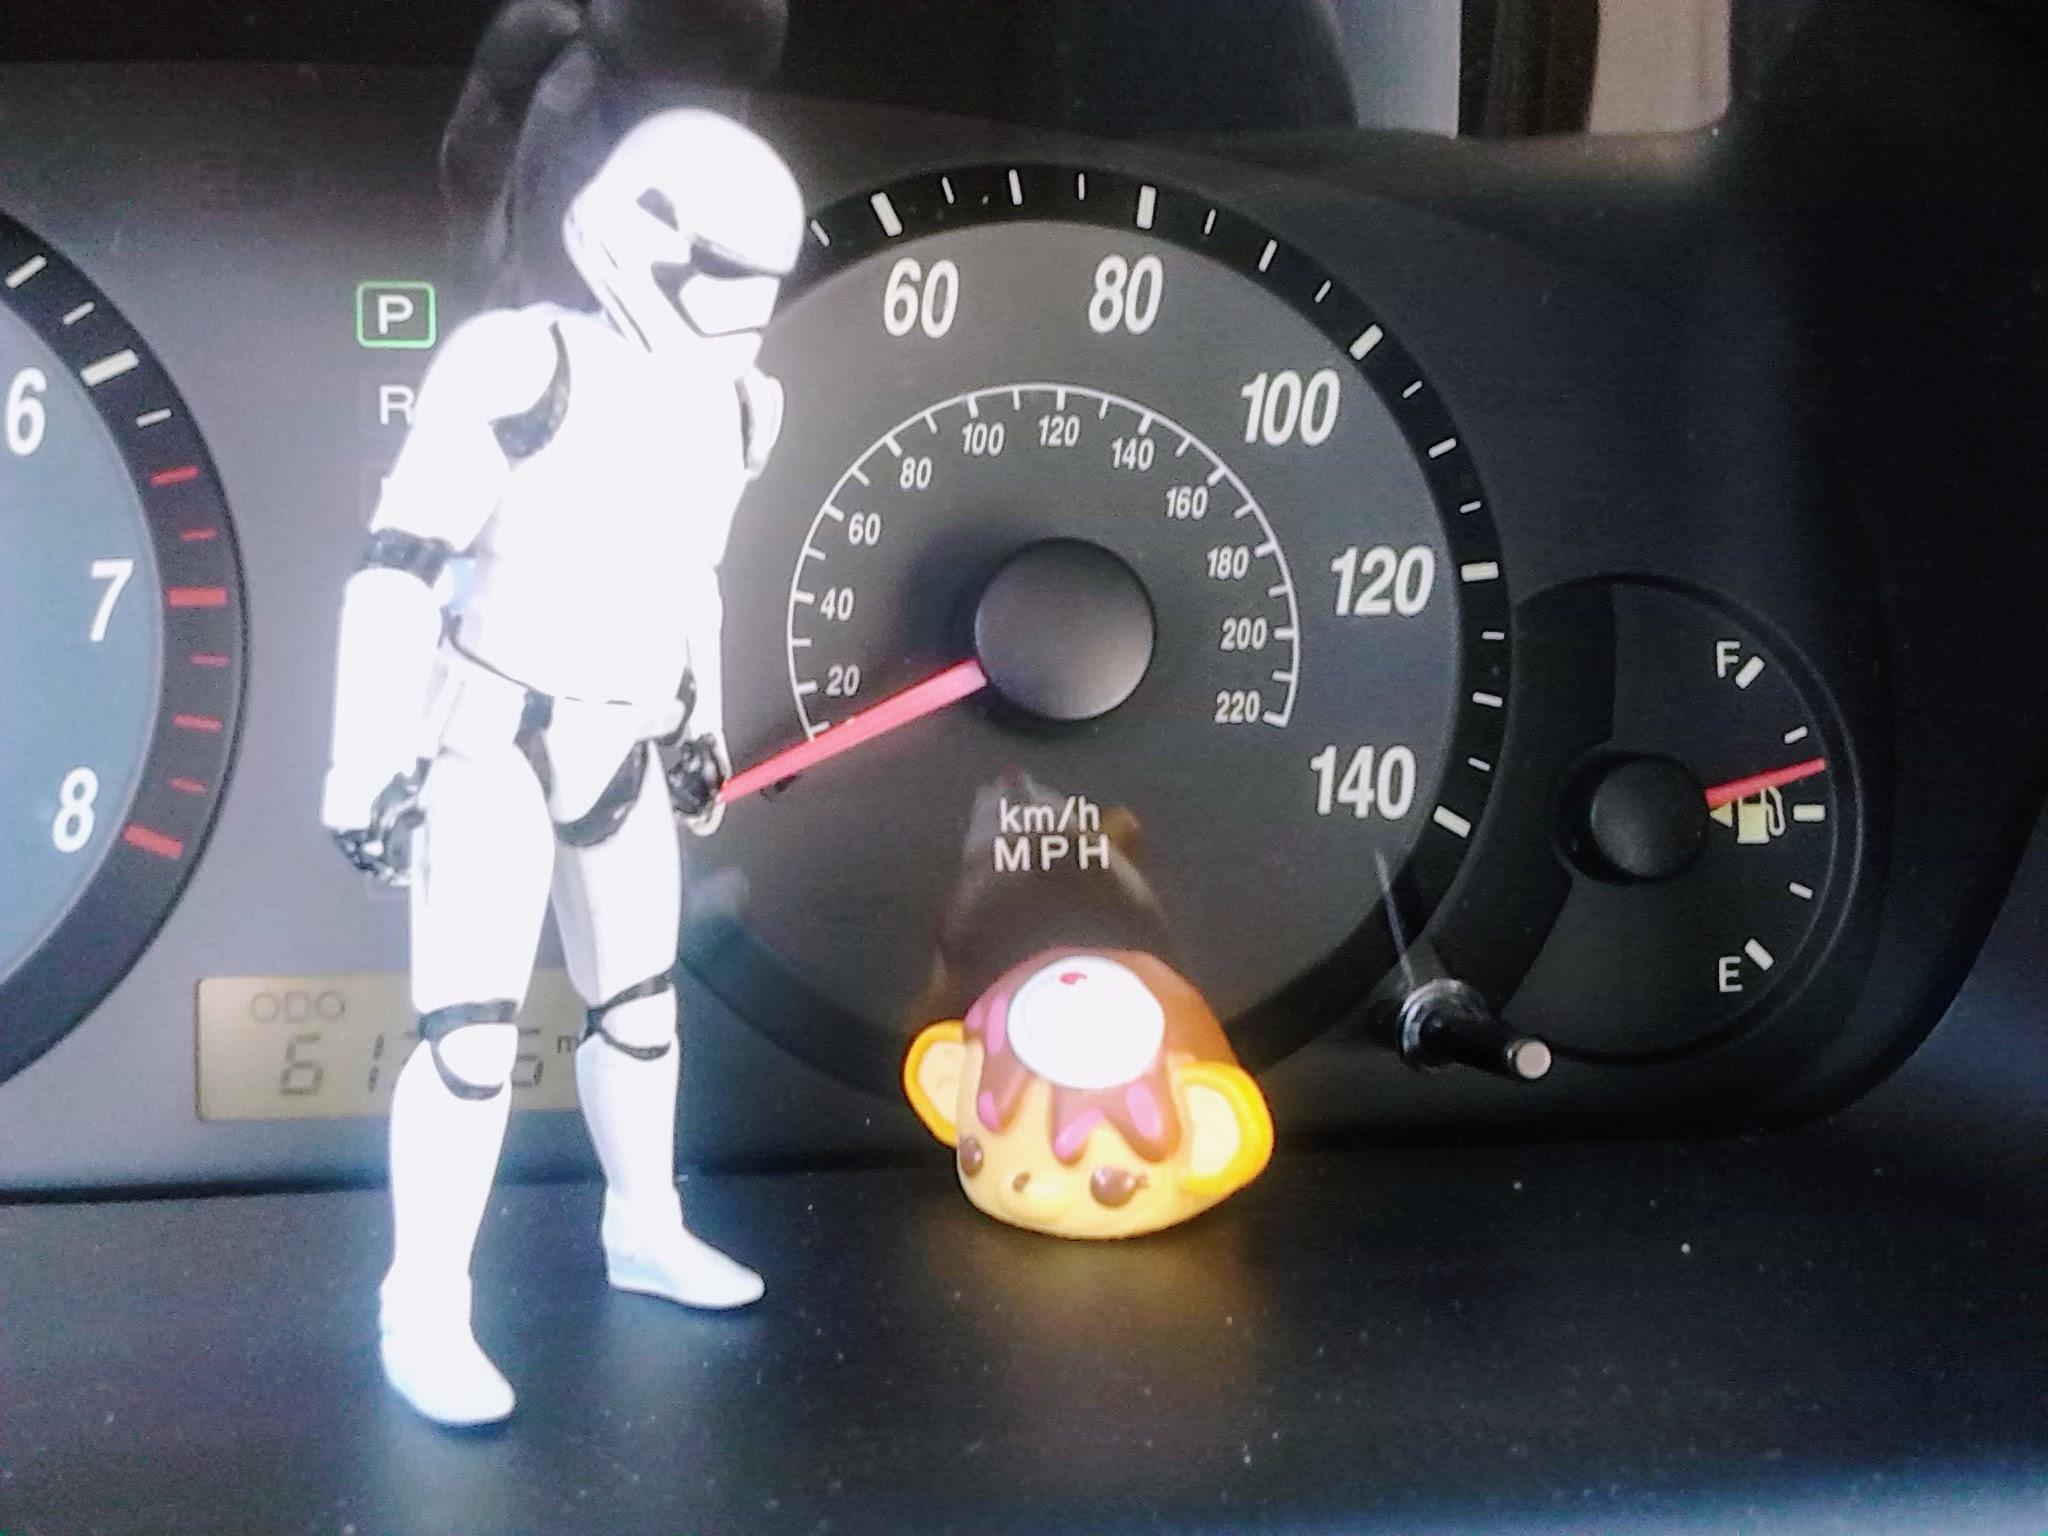 Stormtrooper numnum